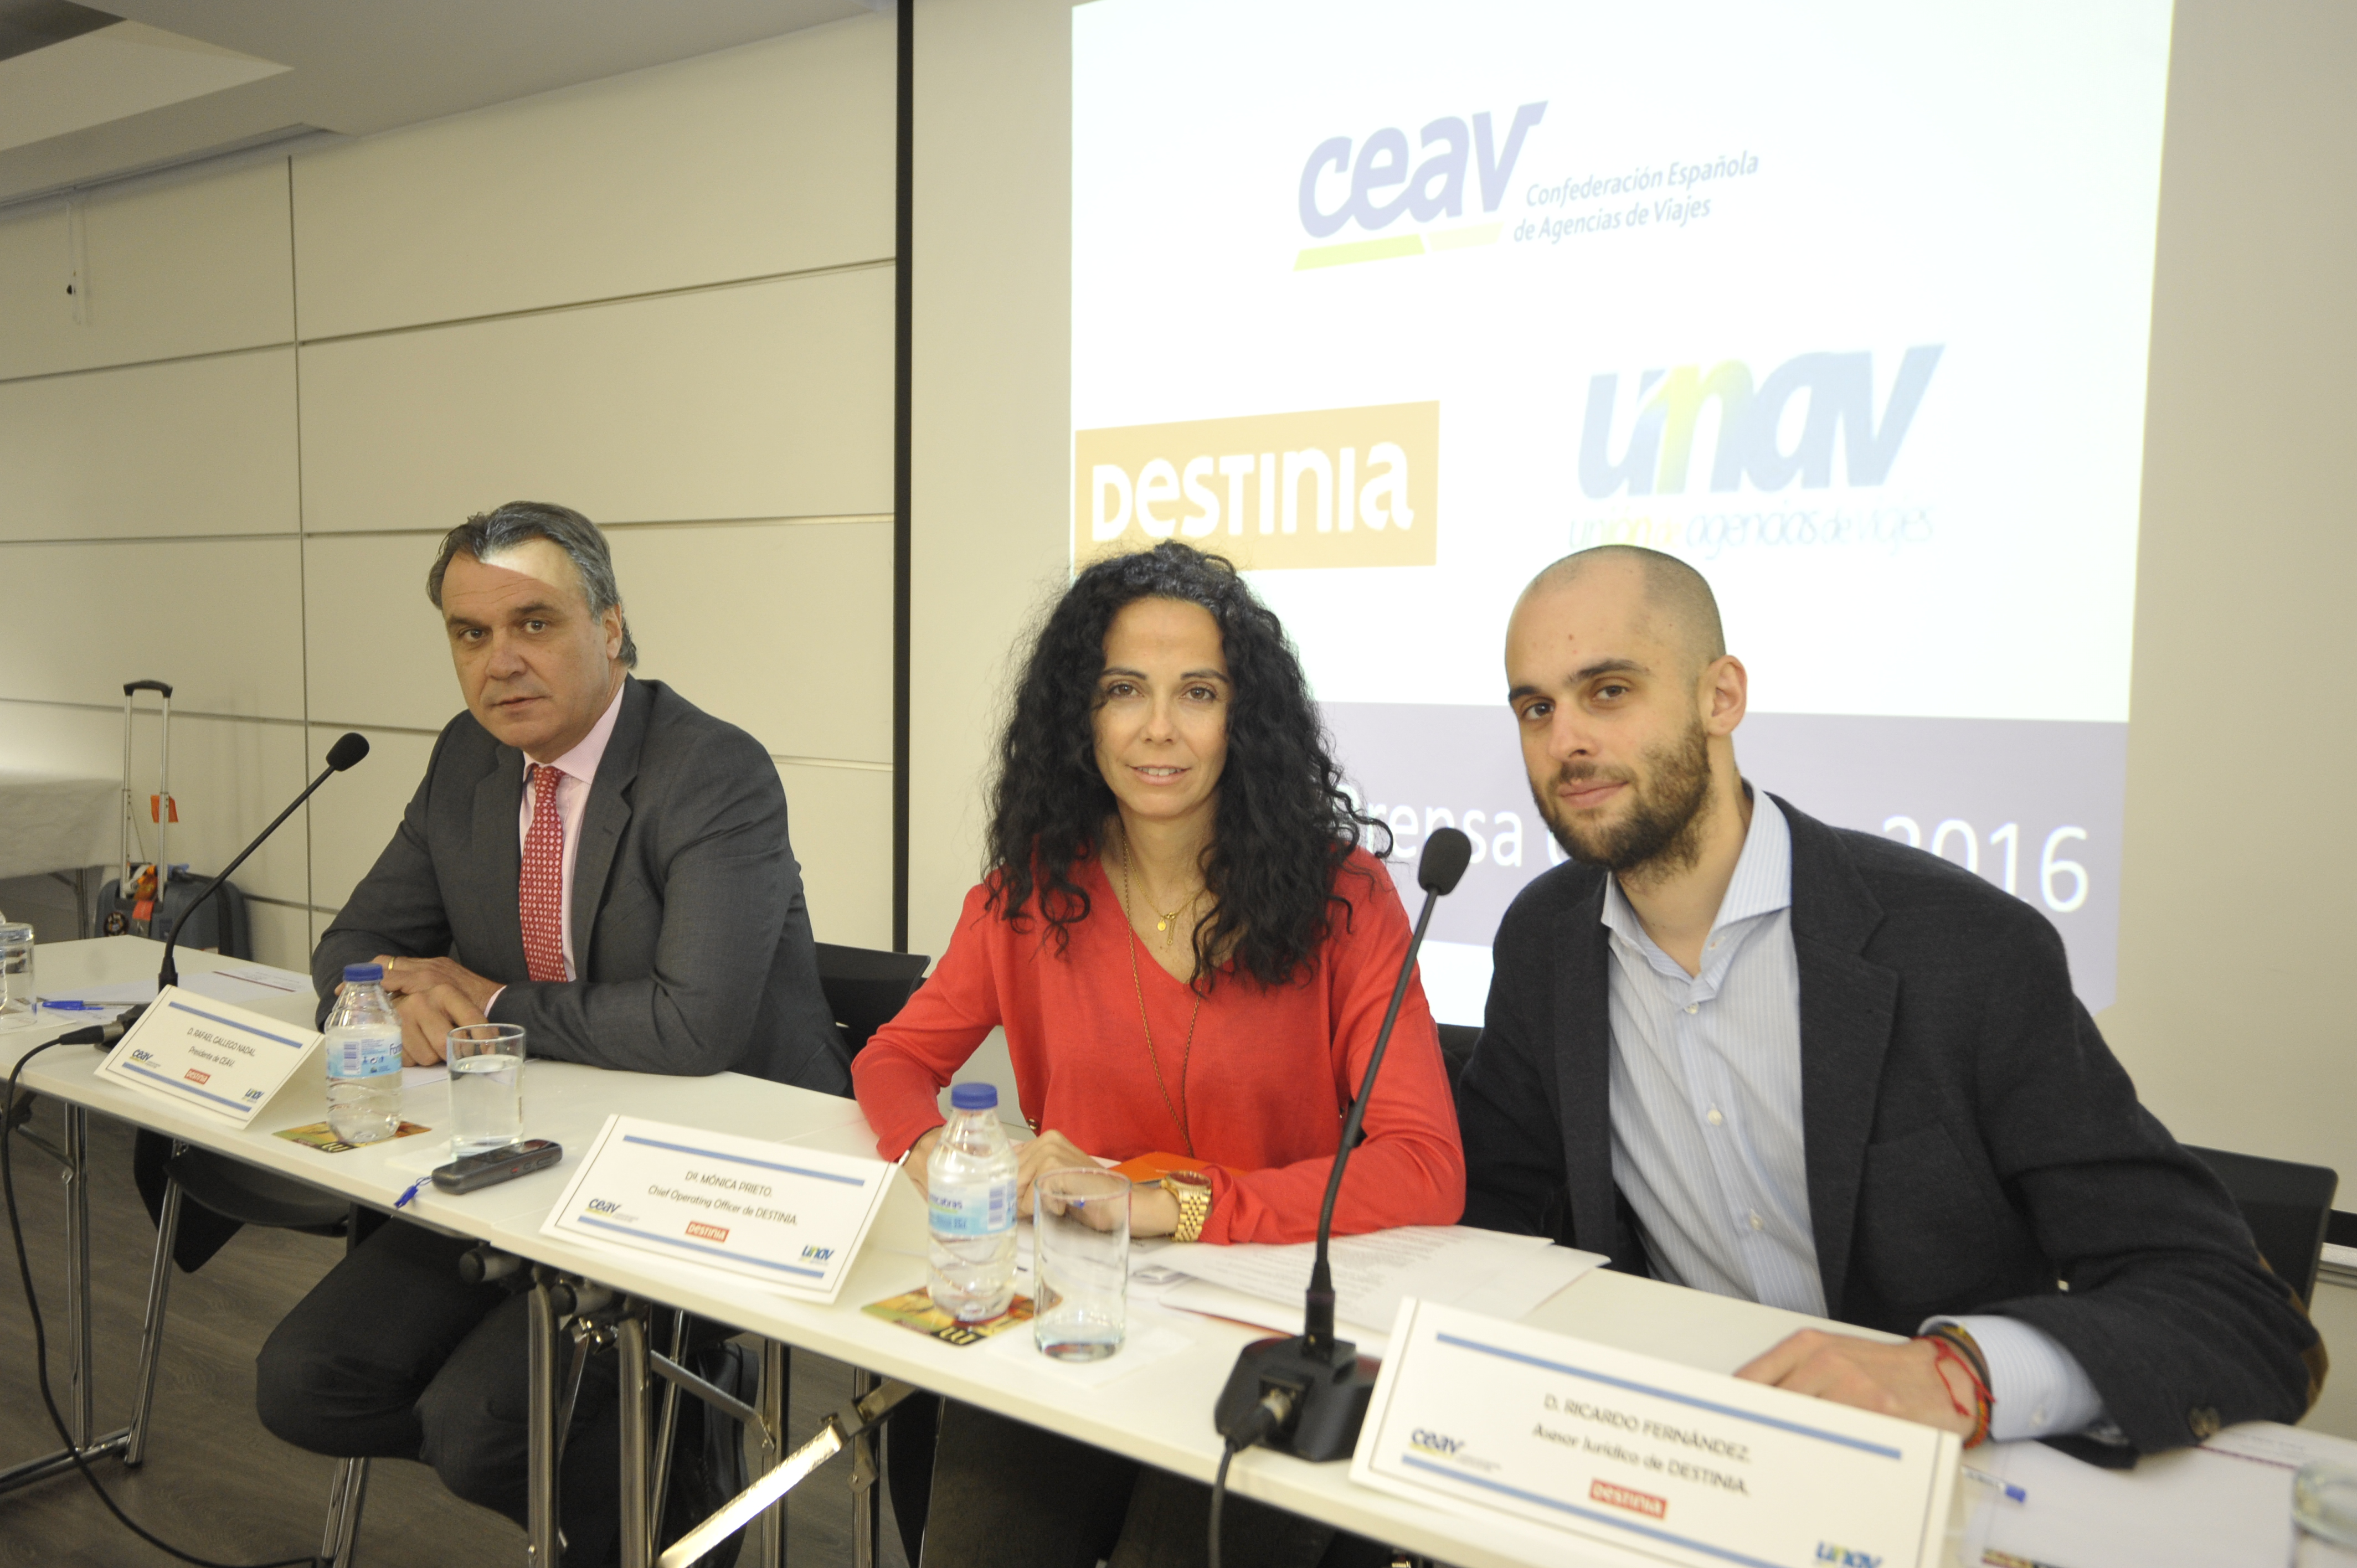 Rafael-Gallego-Monica-Prieto-Destinia-CEAV